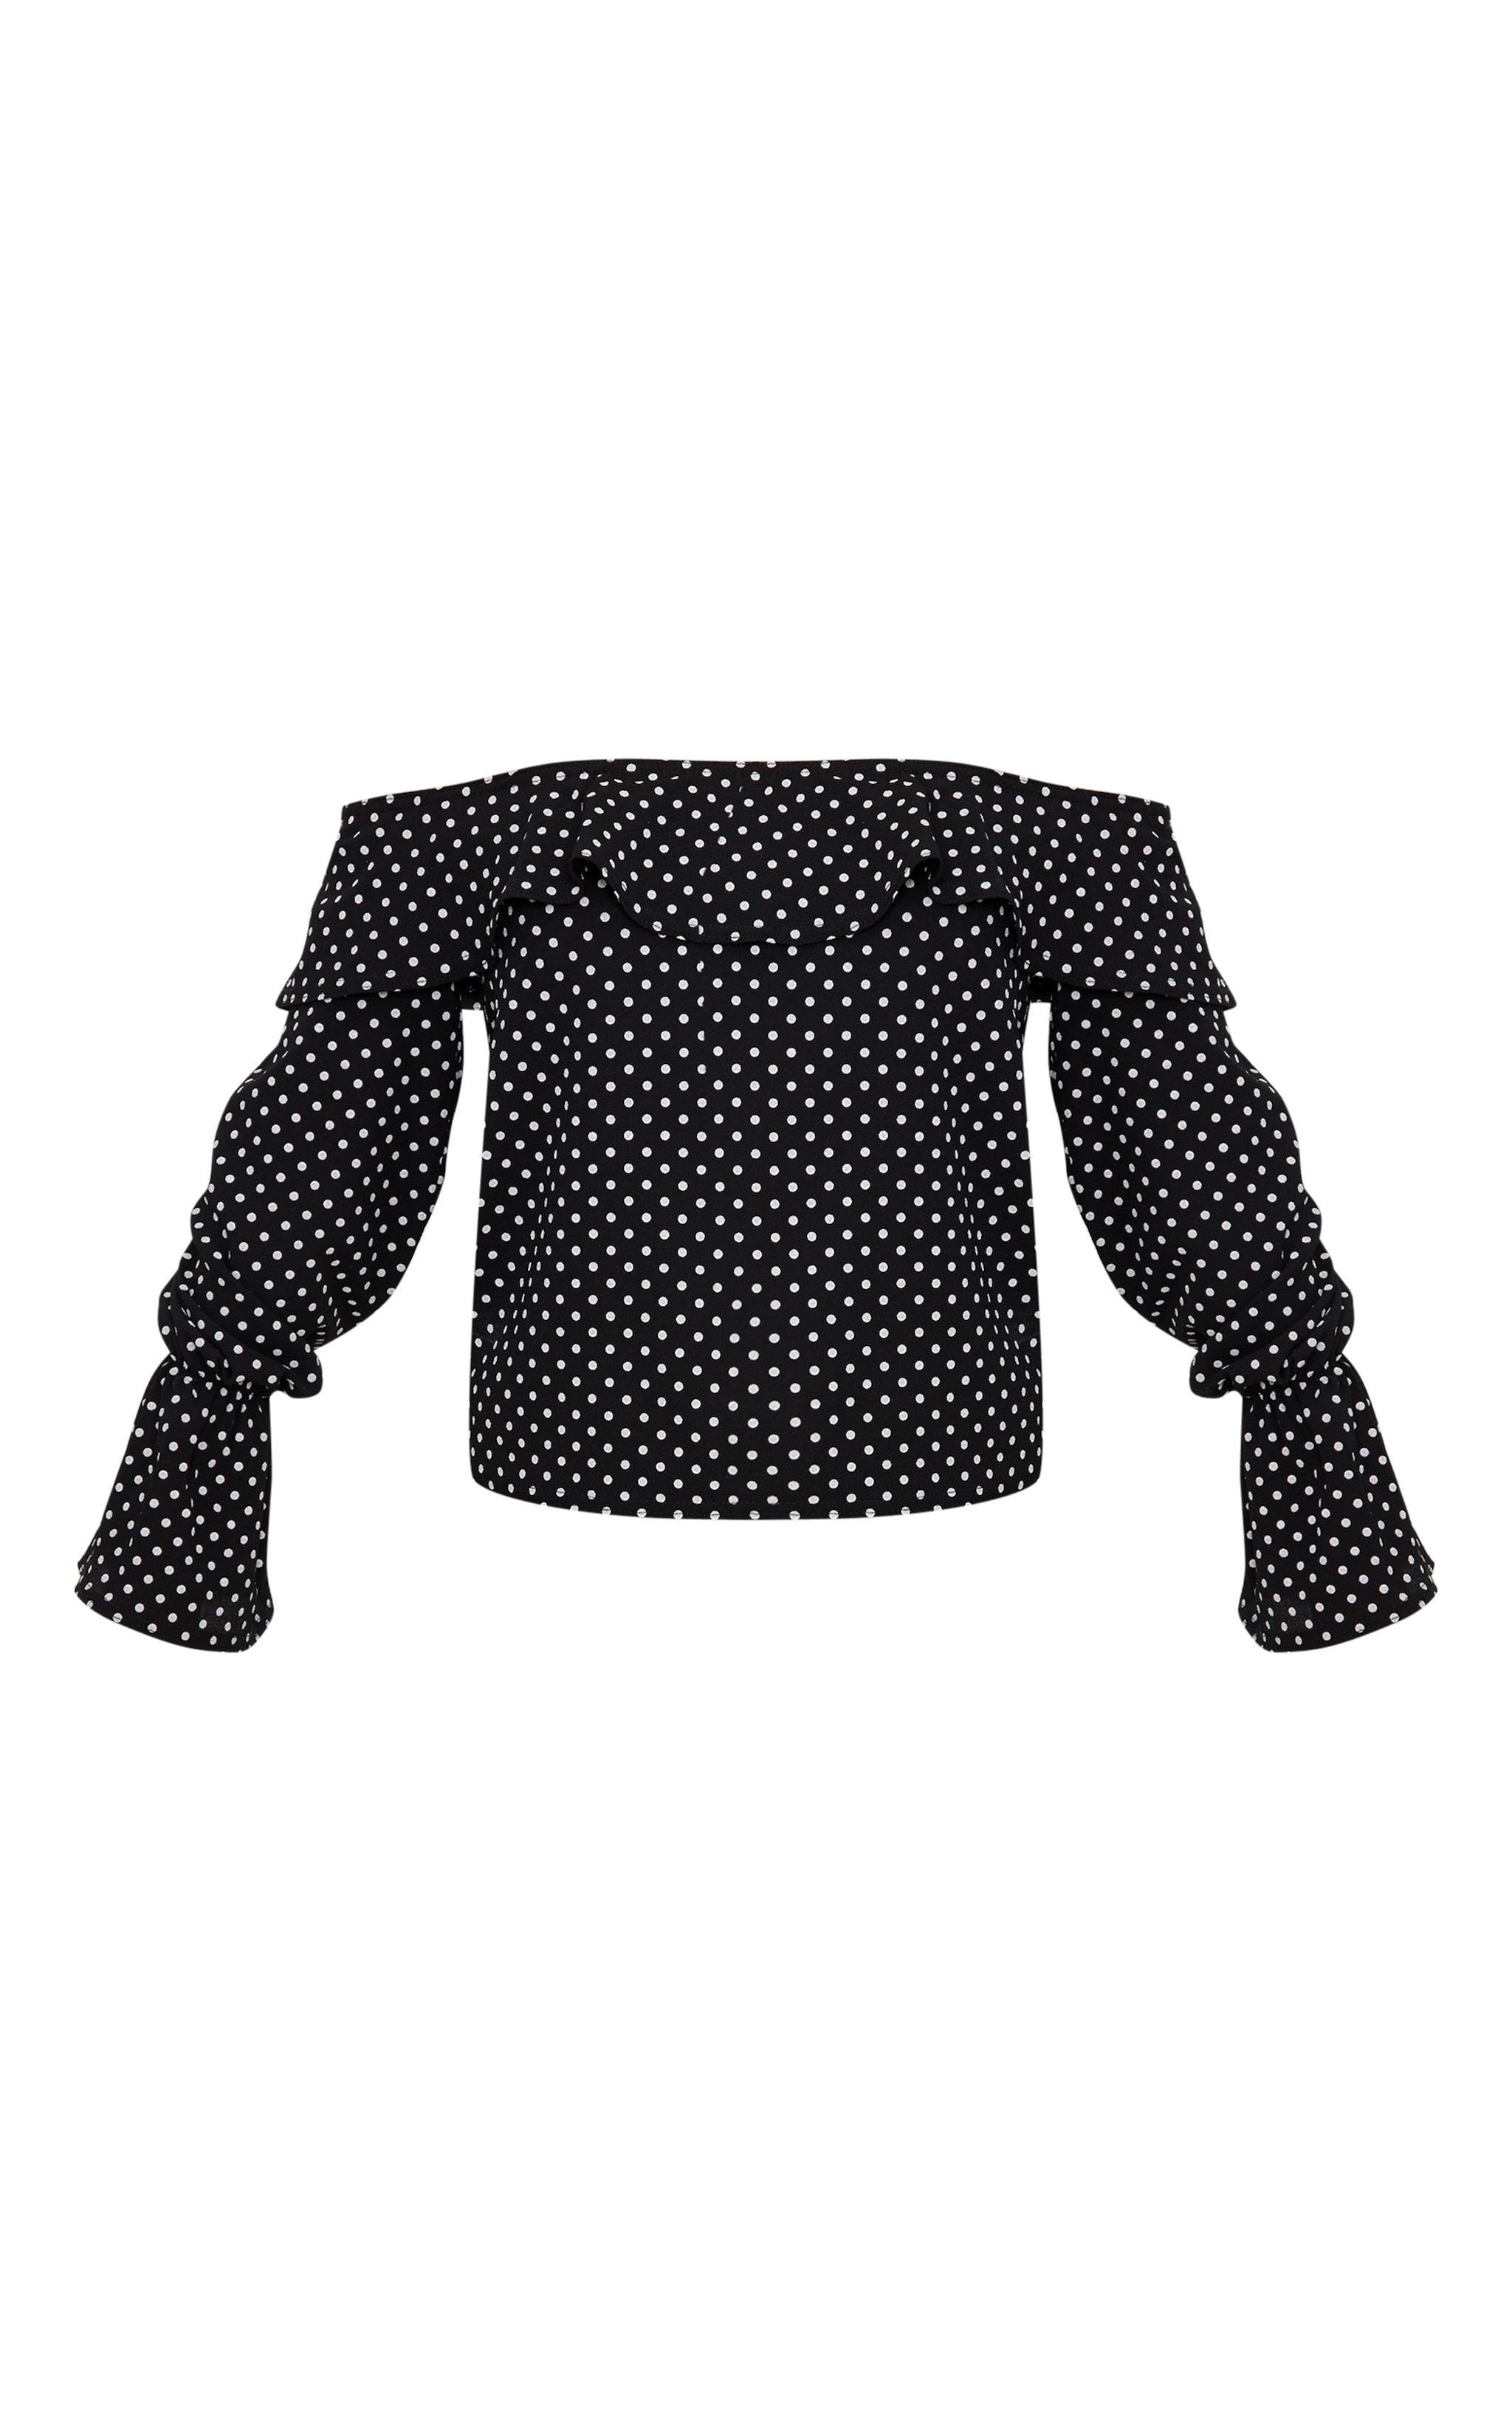 Black Chiffon Polka Dot Bardot Blouse  3